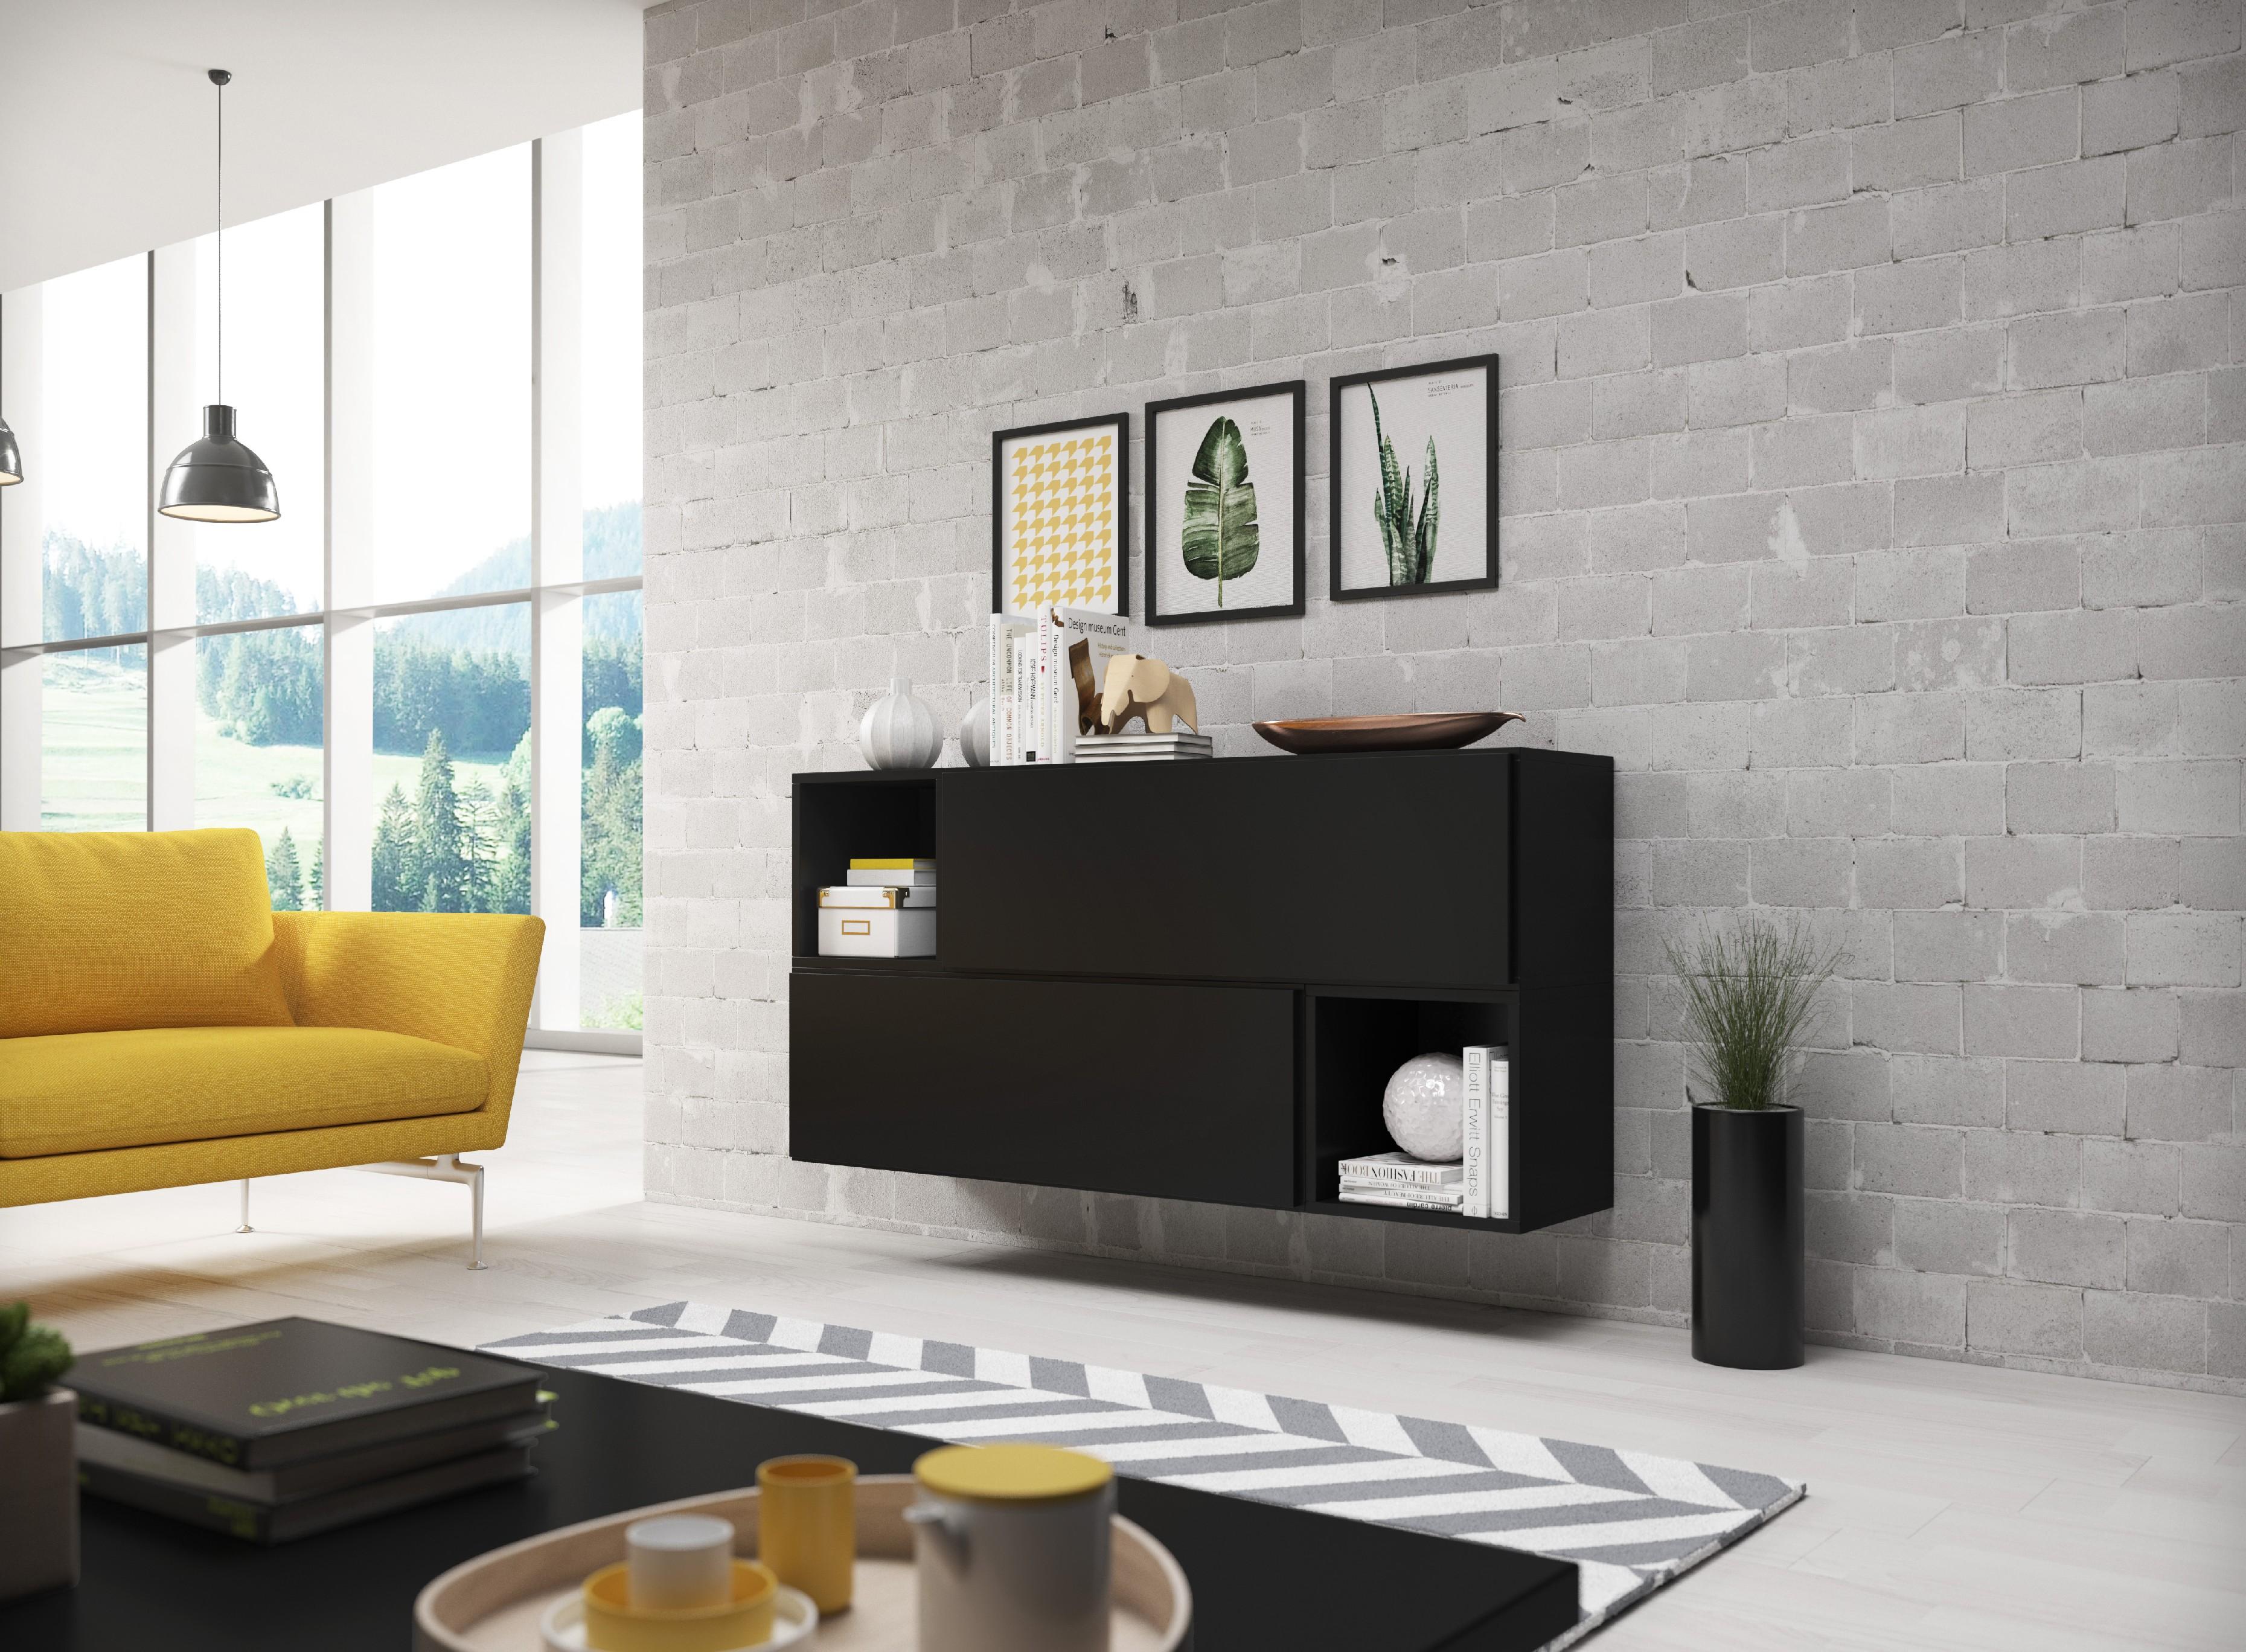 Artcam Zostava do obývačky ROCO 14 roco: korpus čierny mat / okraj čierny mat / dvierka čierny mat